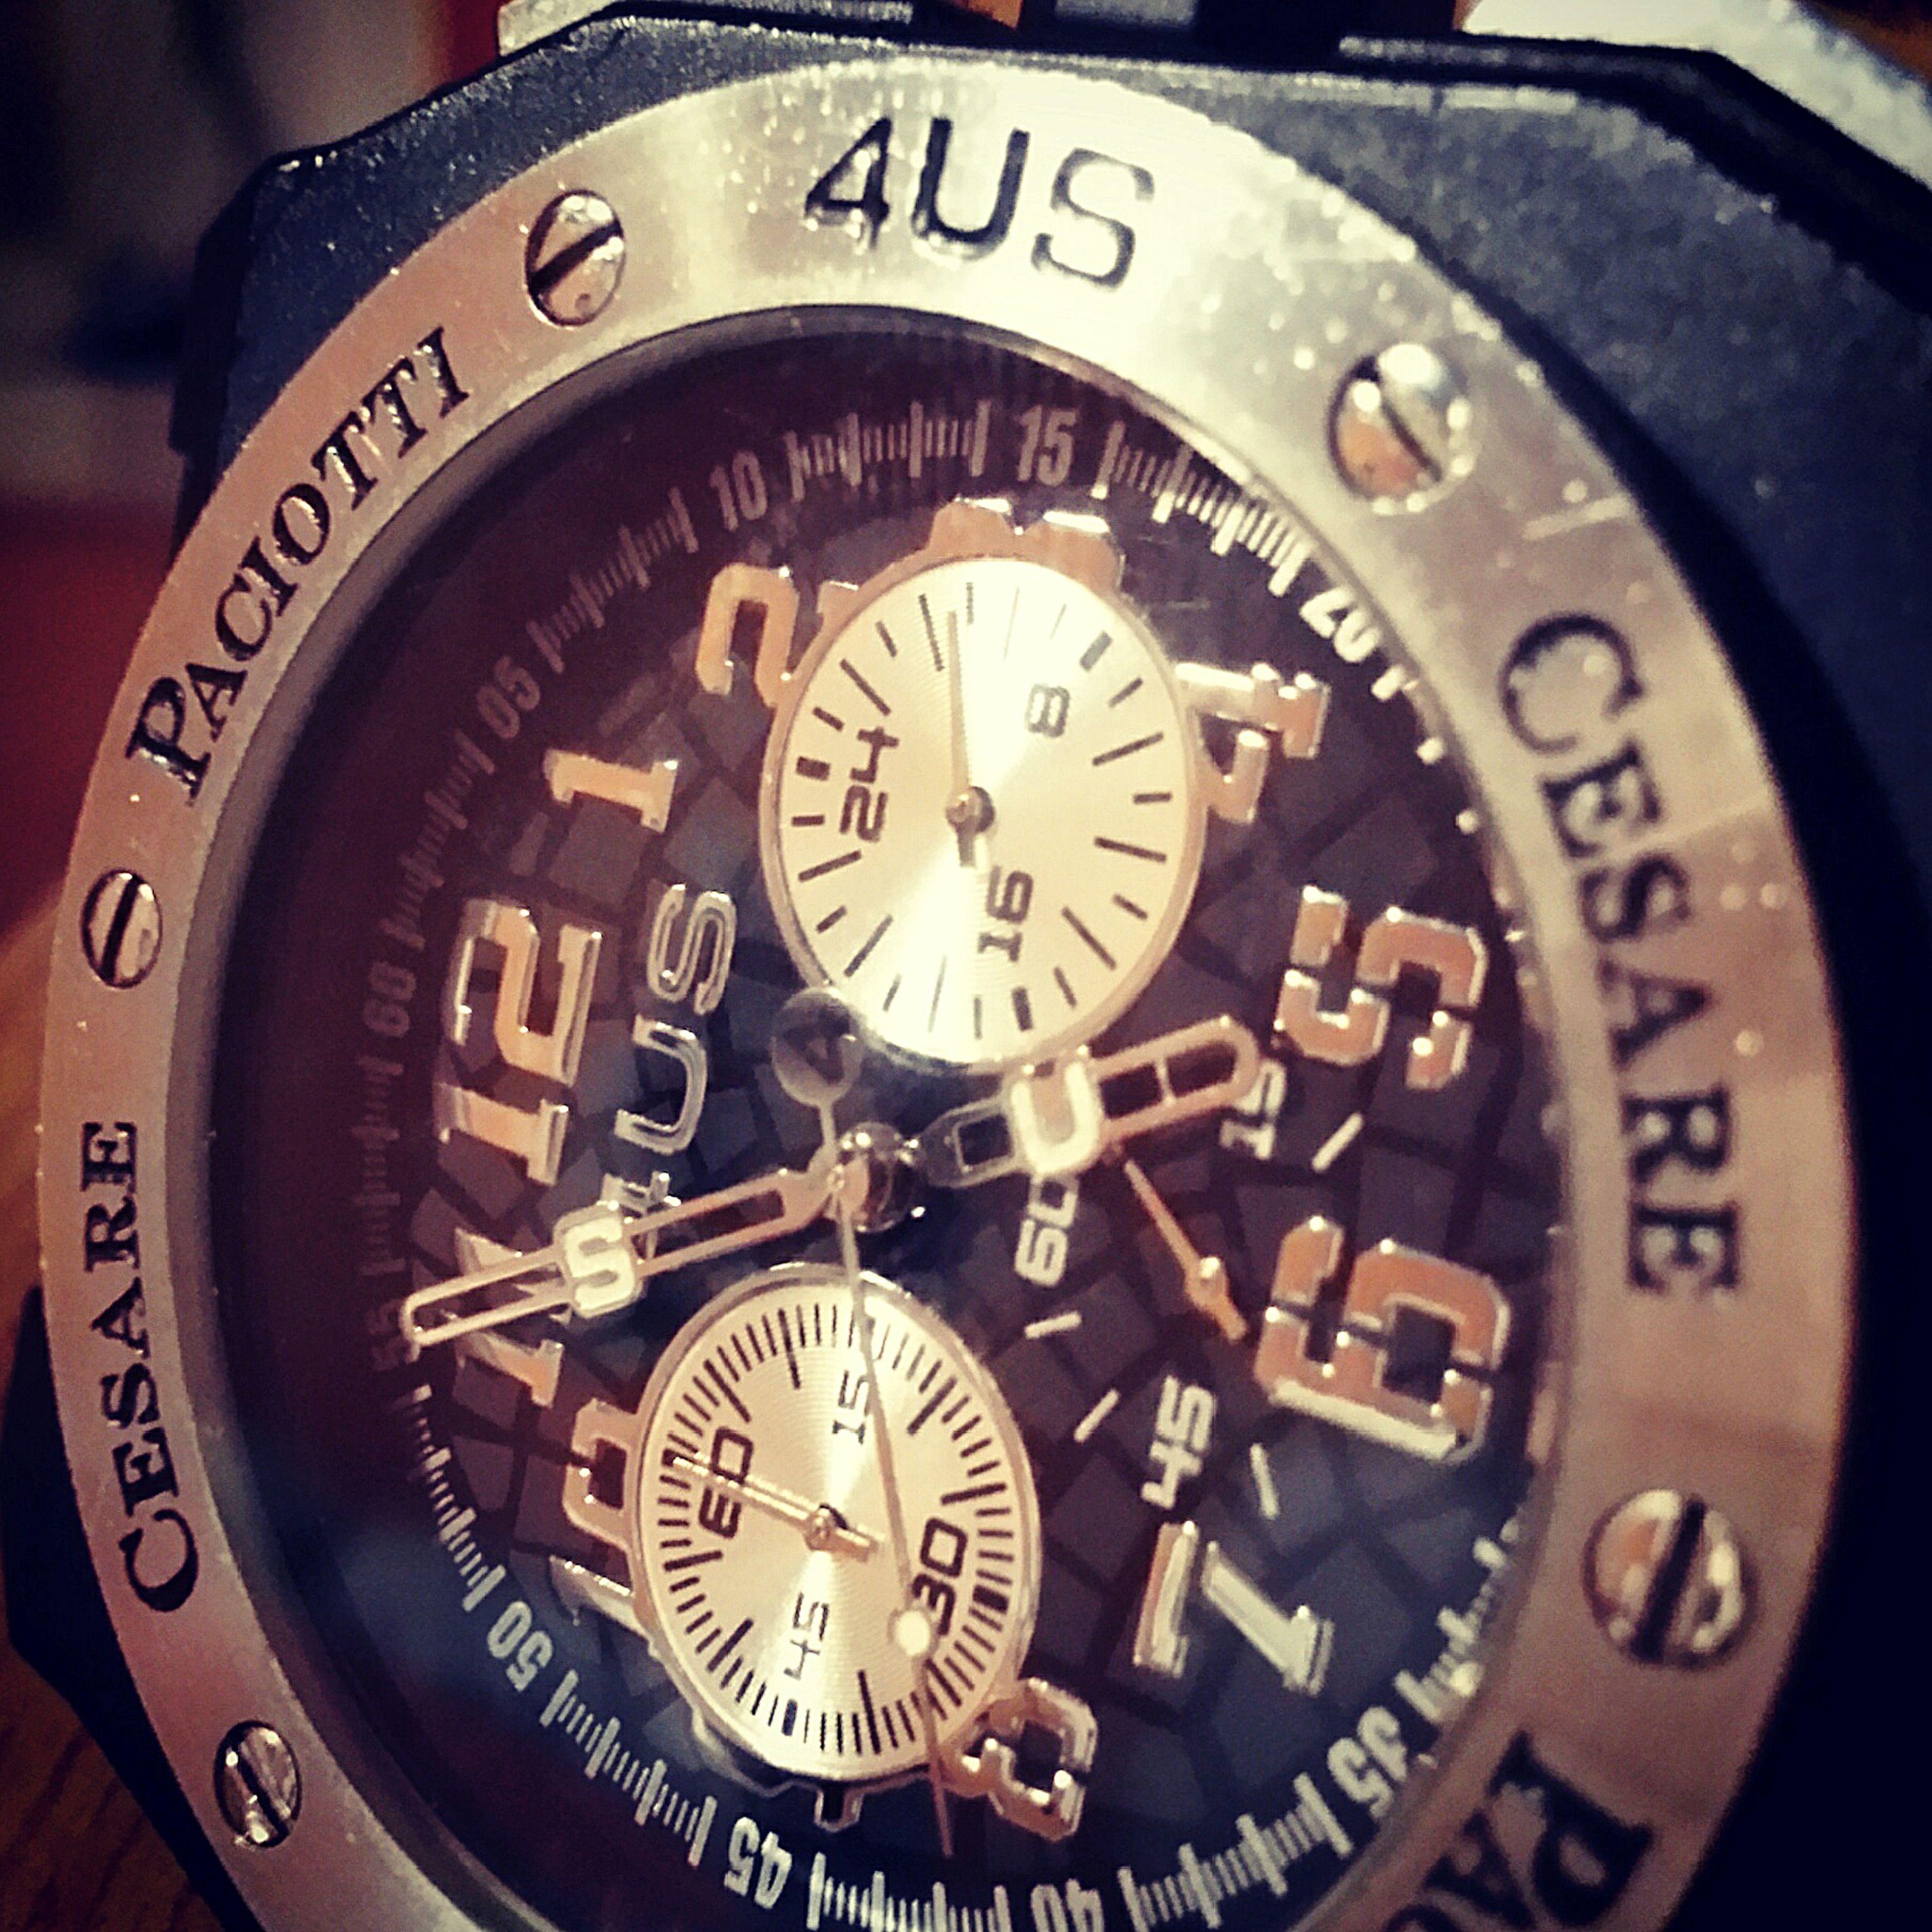 Watches Watching Jewelry Fashioguys Fashion 4us Cesarepaciotti 4us Times 4us Jewerly